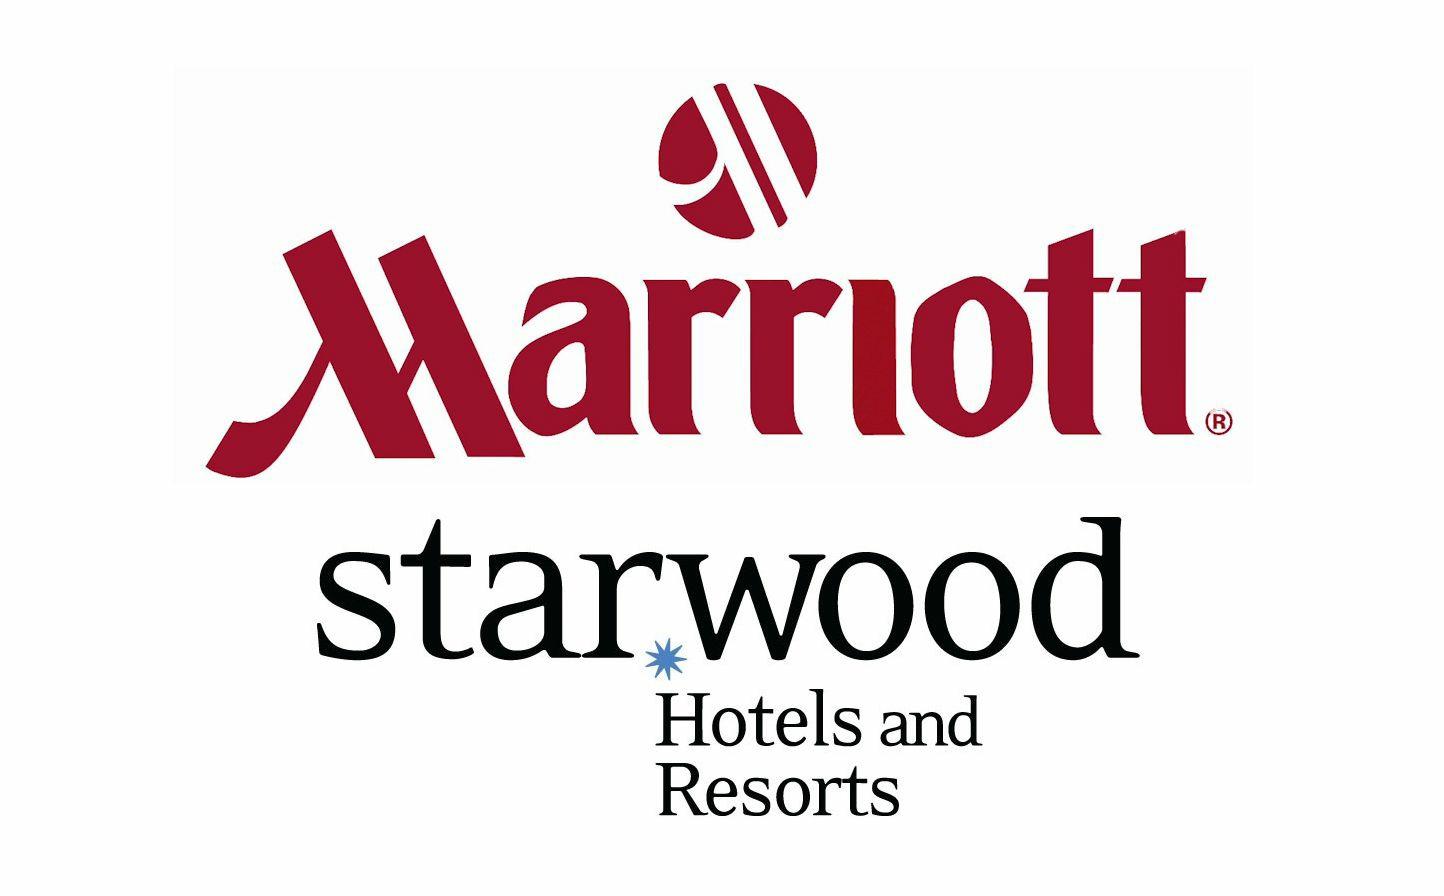 Marriott+Starwood